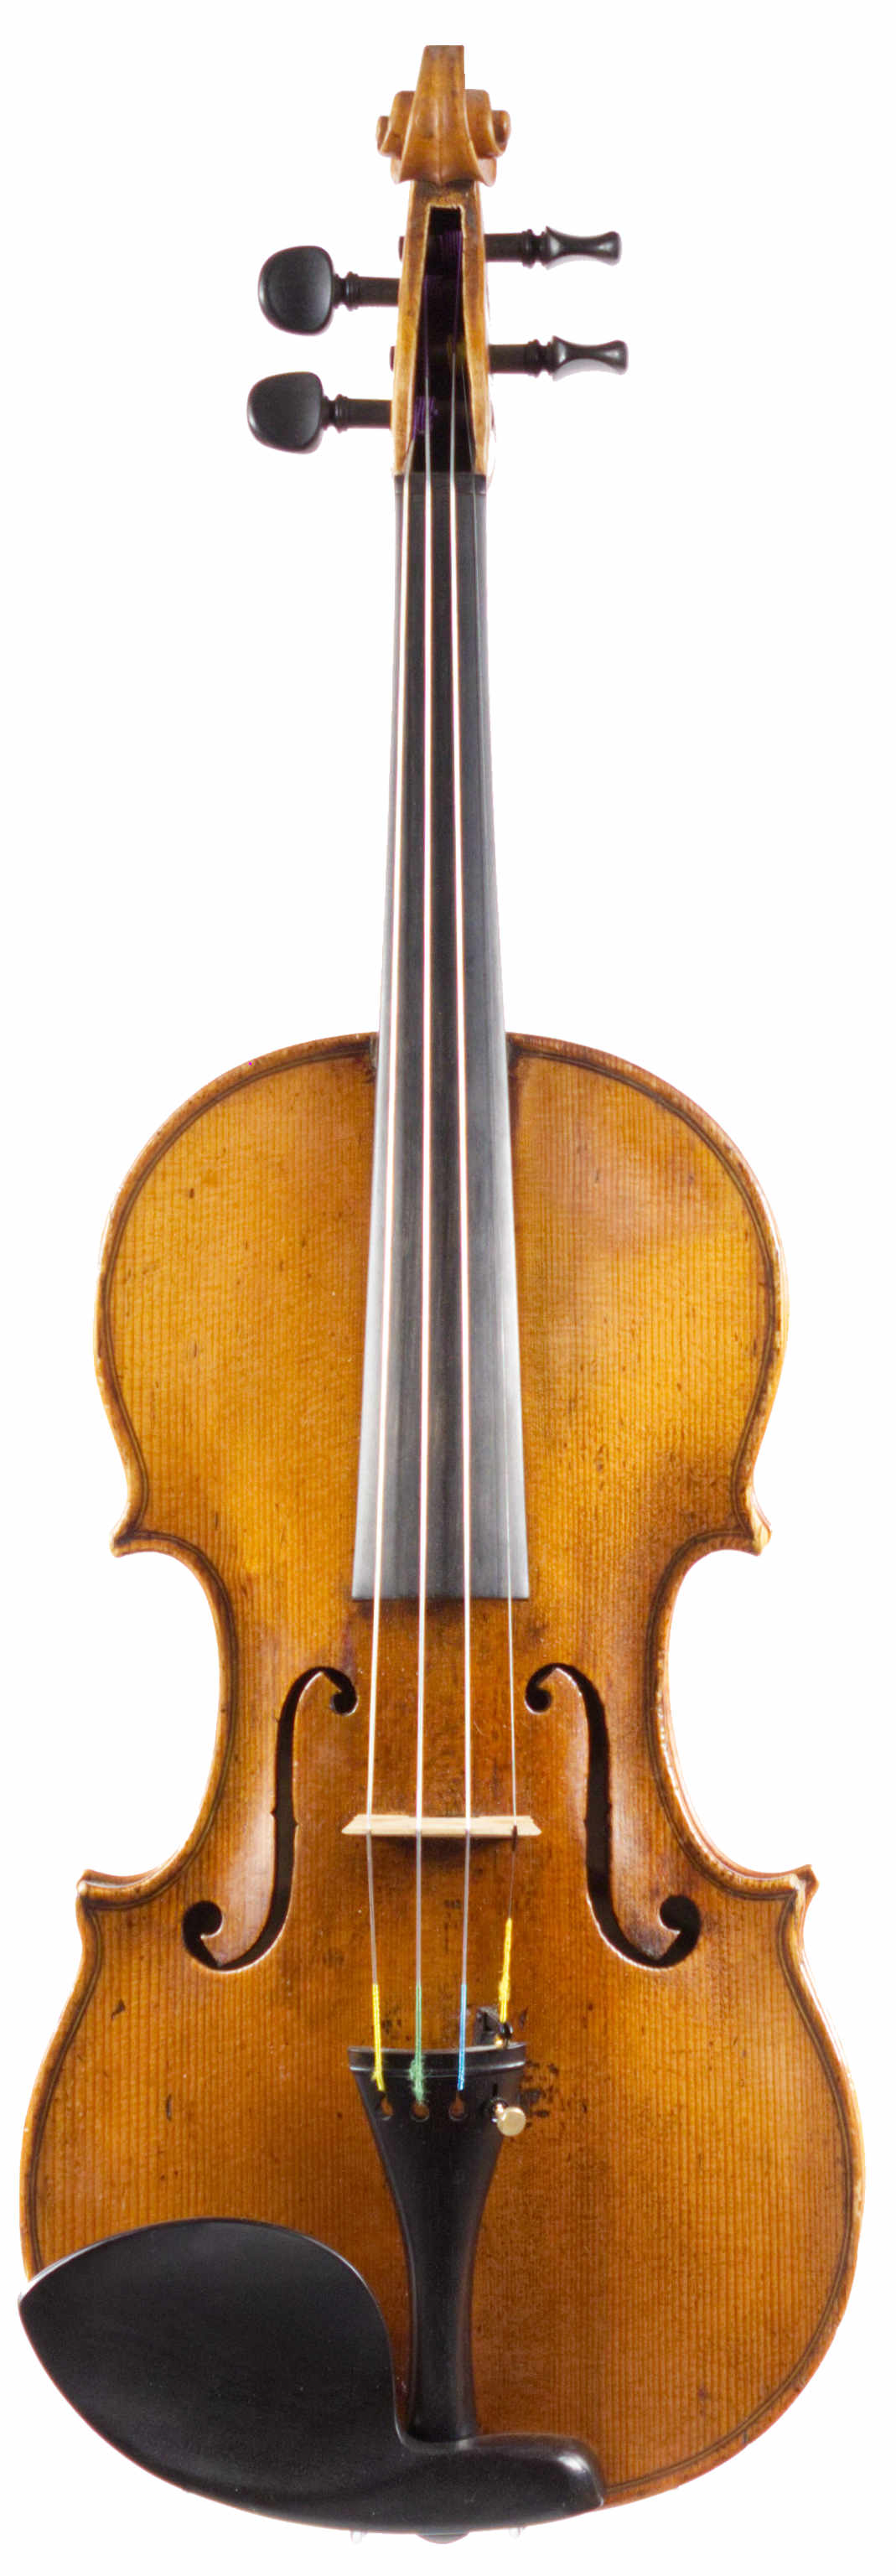 Guersan violin